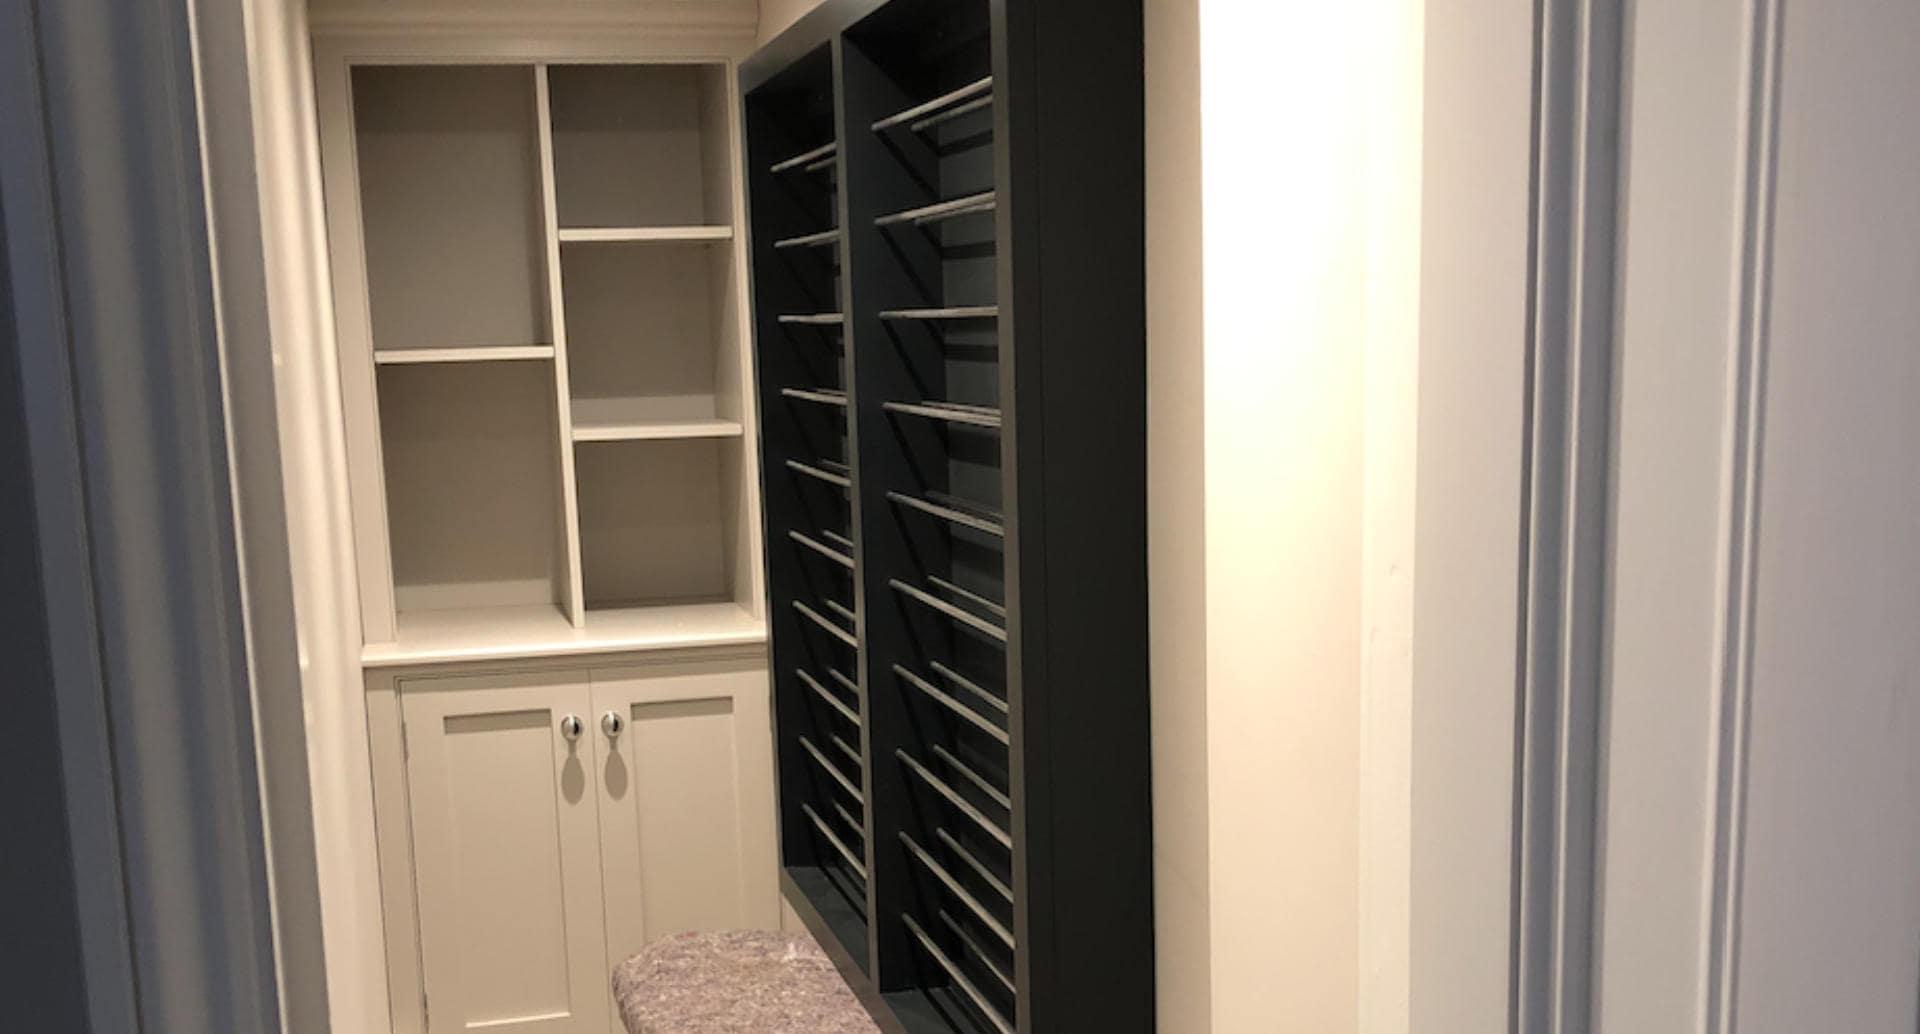 A bespoke wine rack